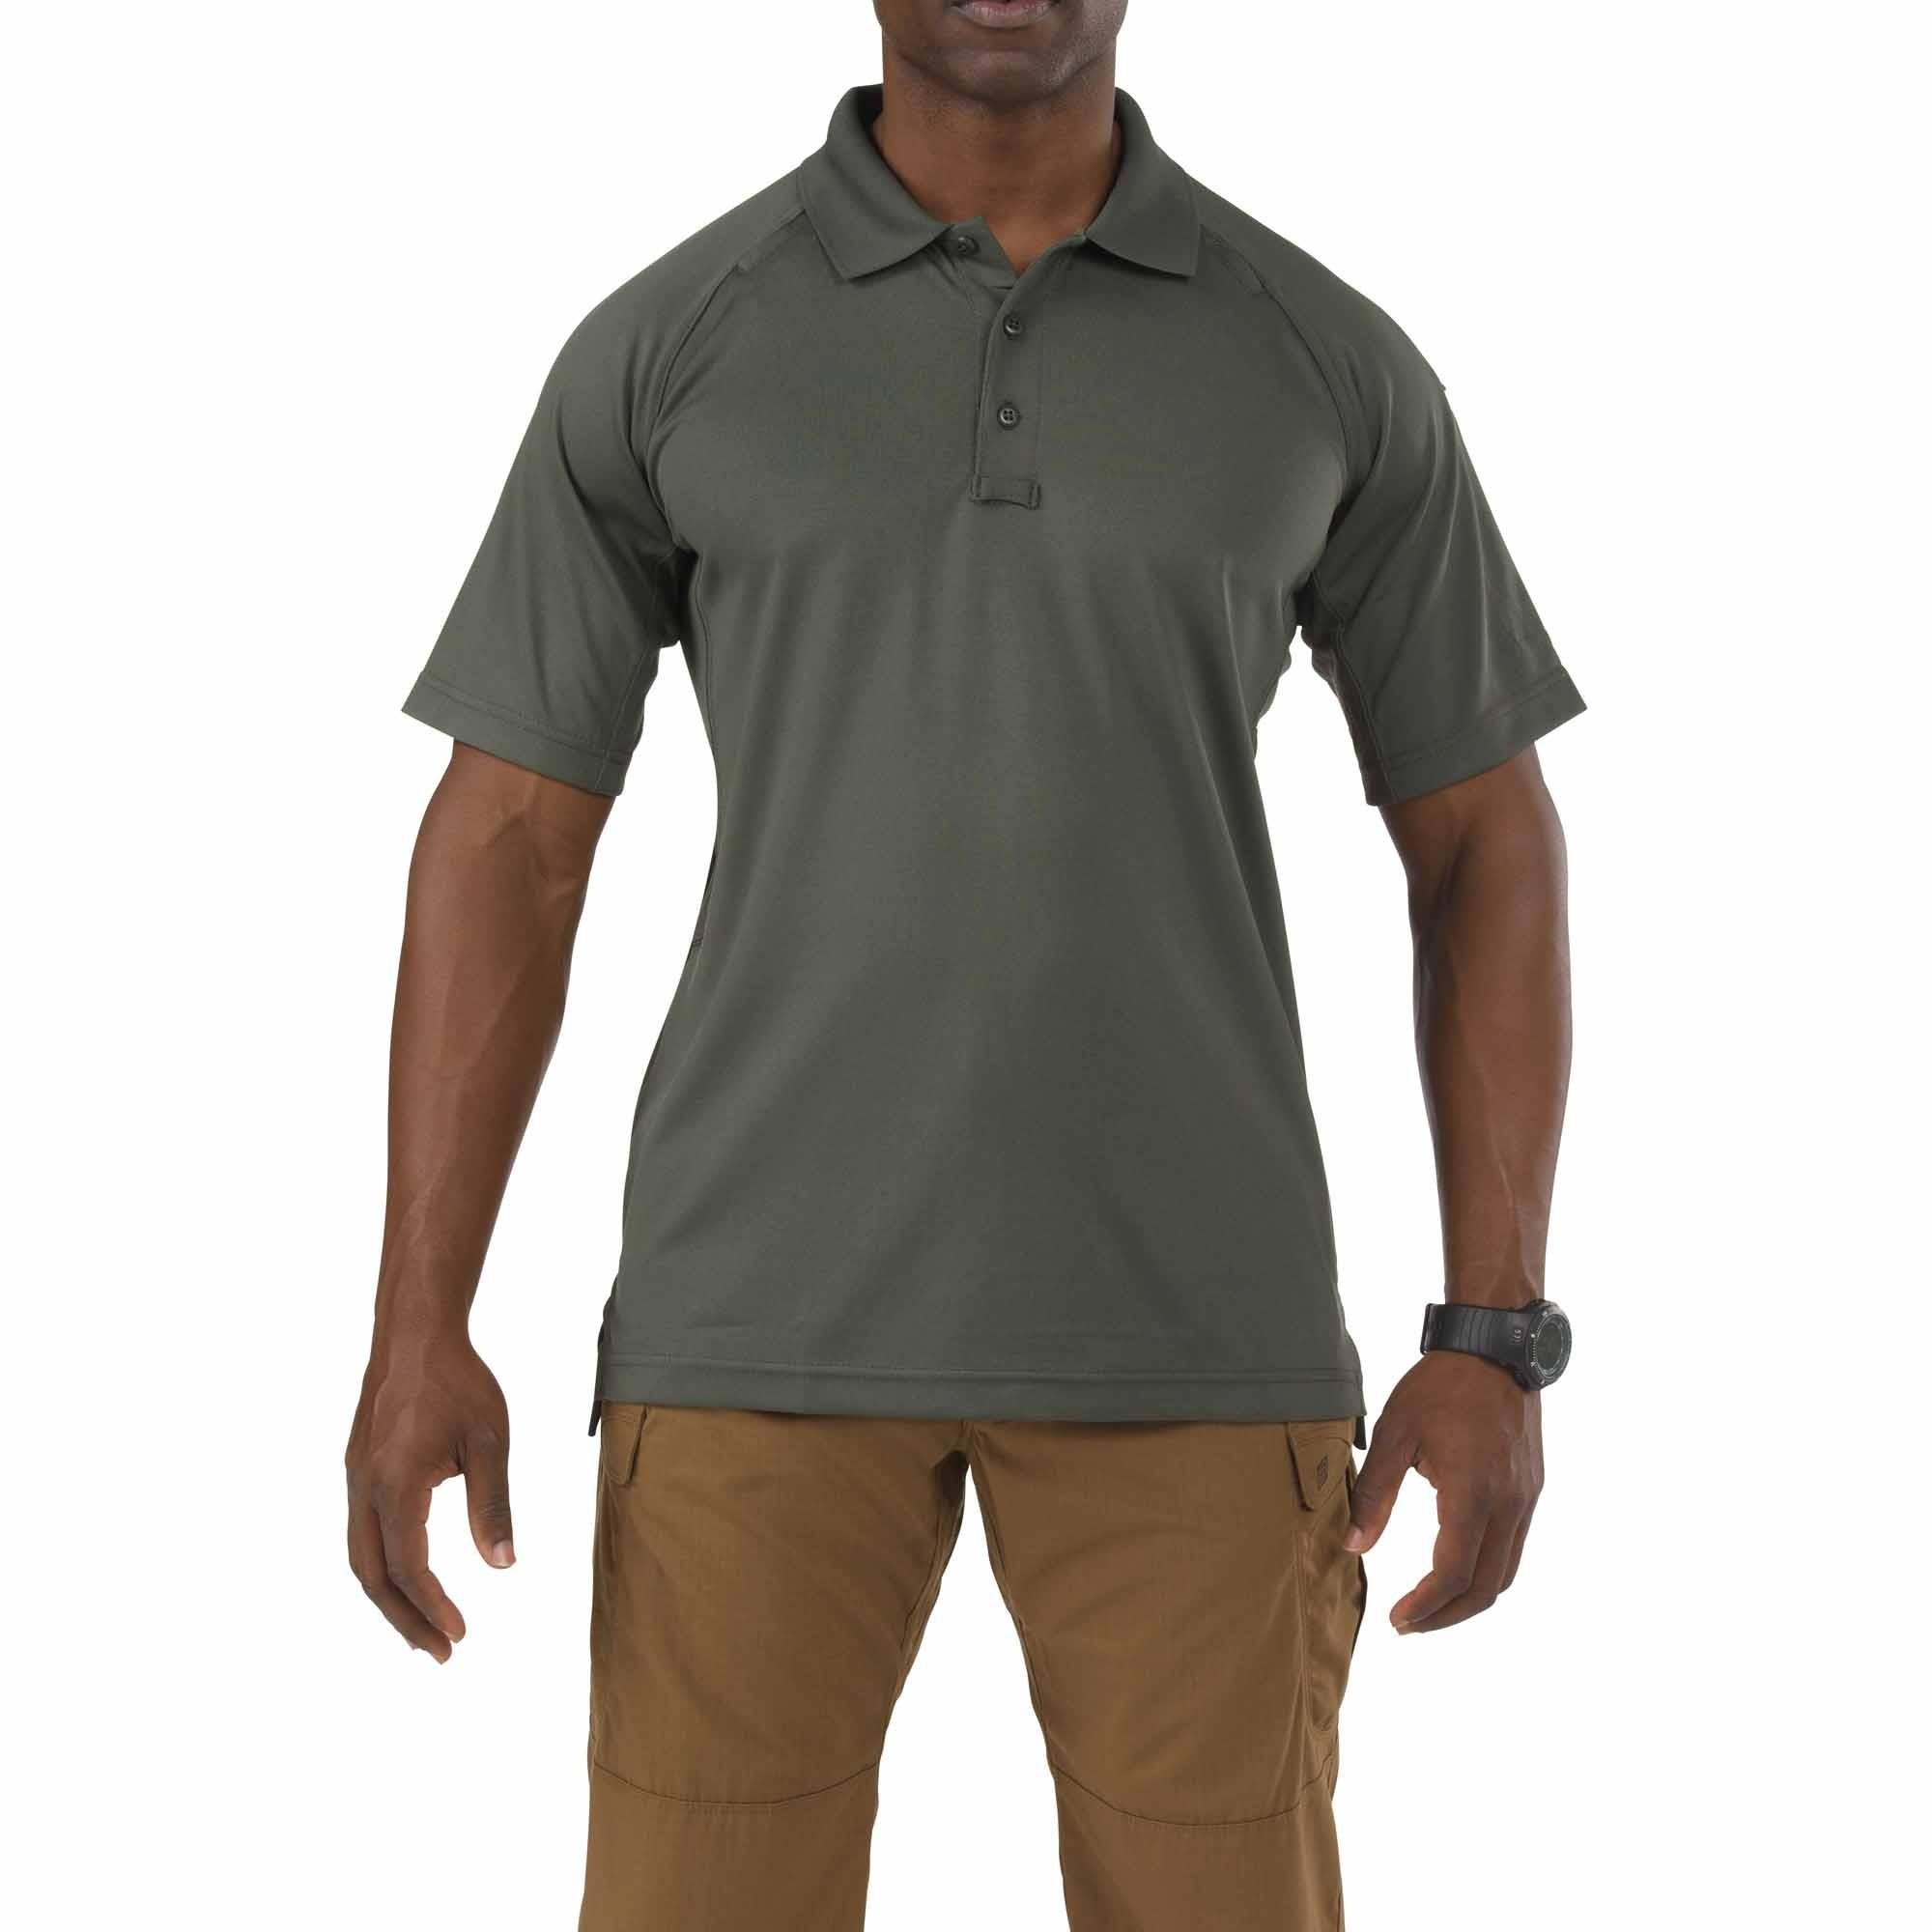 3e55dd014 5.11 Tactical Performance Short-Sleeve Polo 71049 - 511thailand